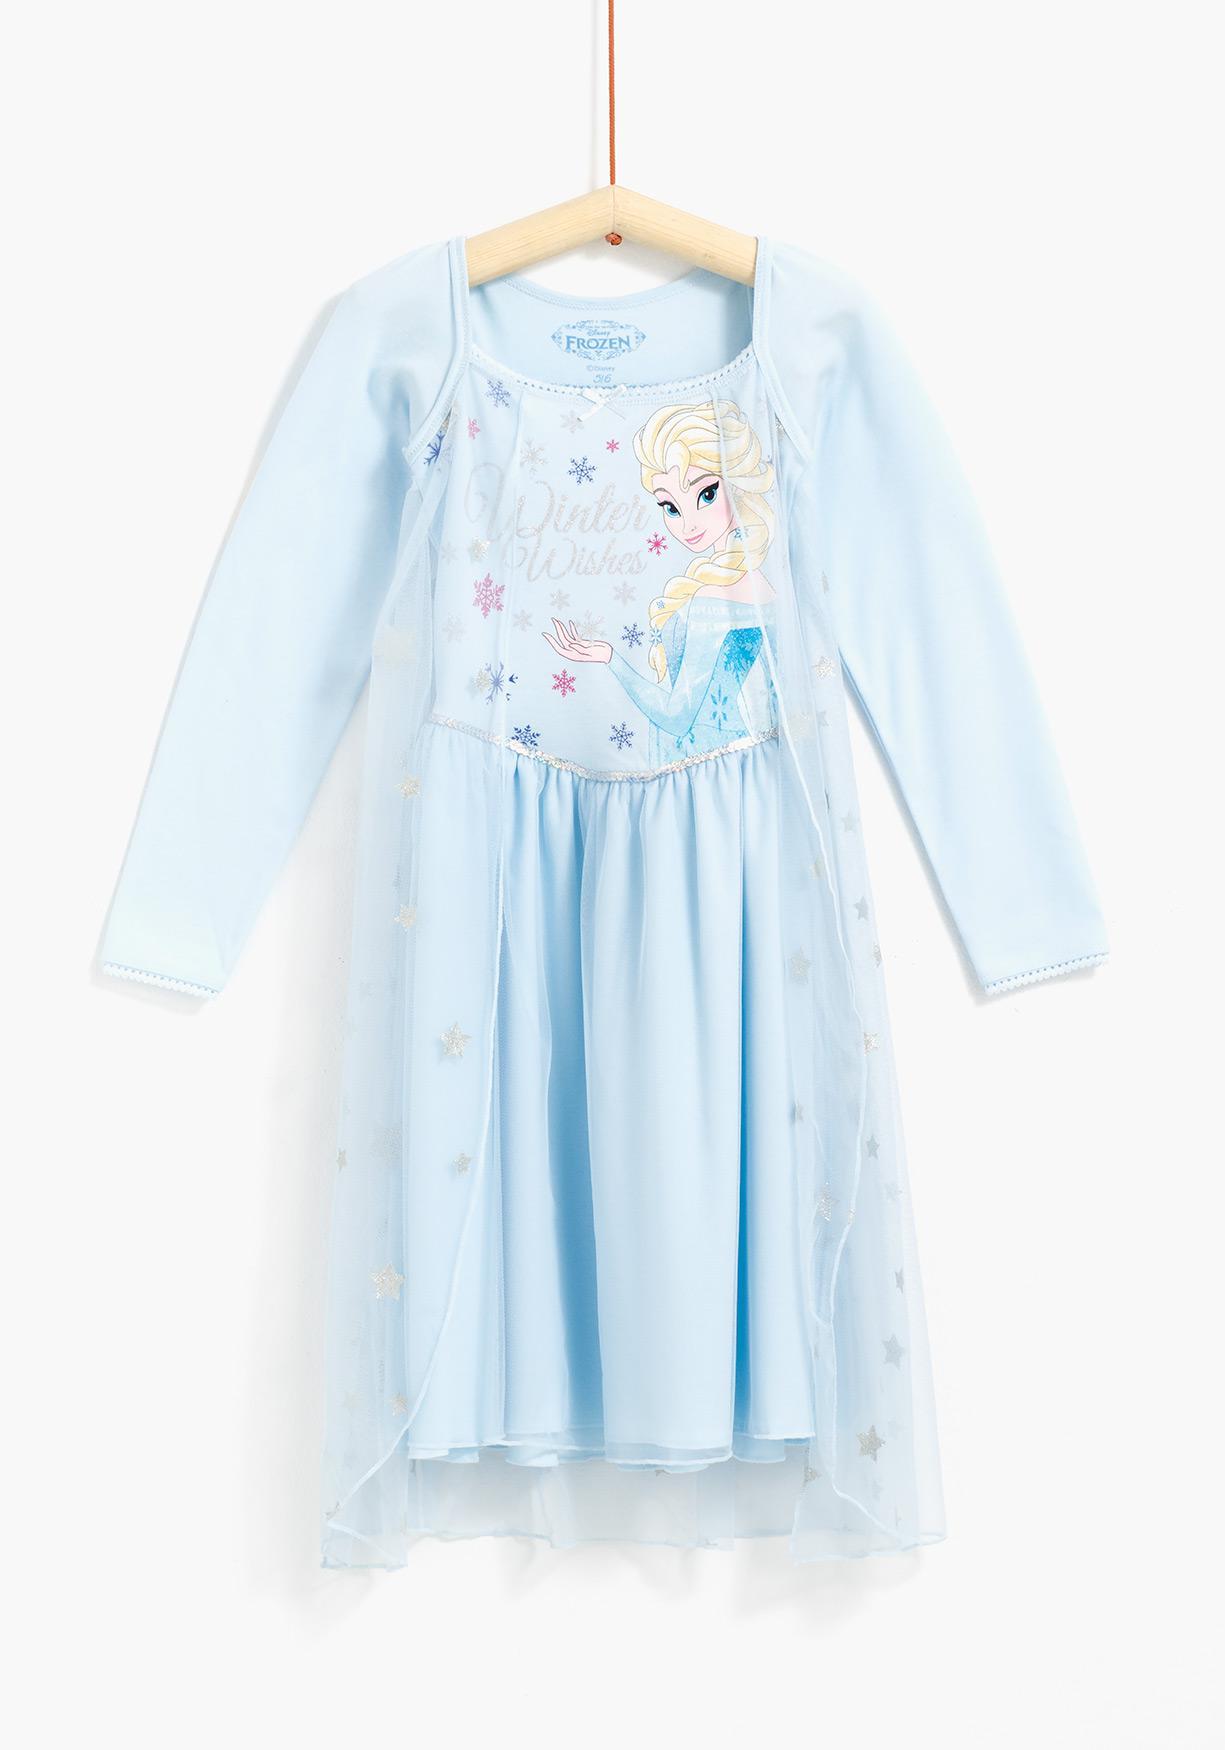 2918e101da Comprar Pijama disfraz Frozen de DISNEY. ¡Aprovéchate de nuestros ...